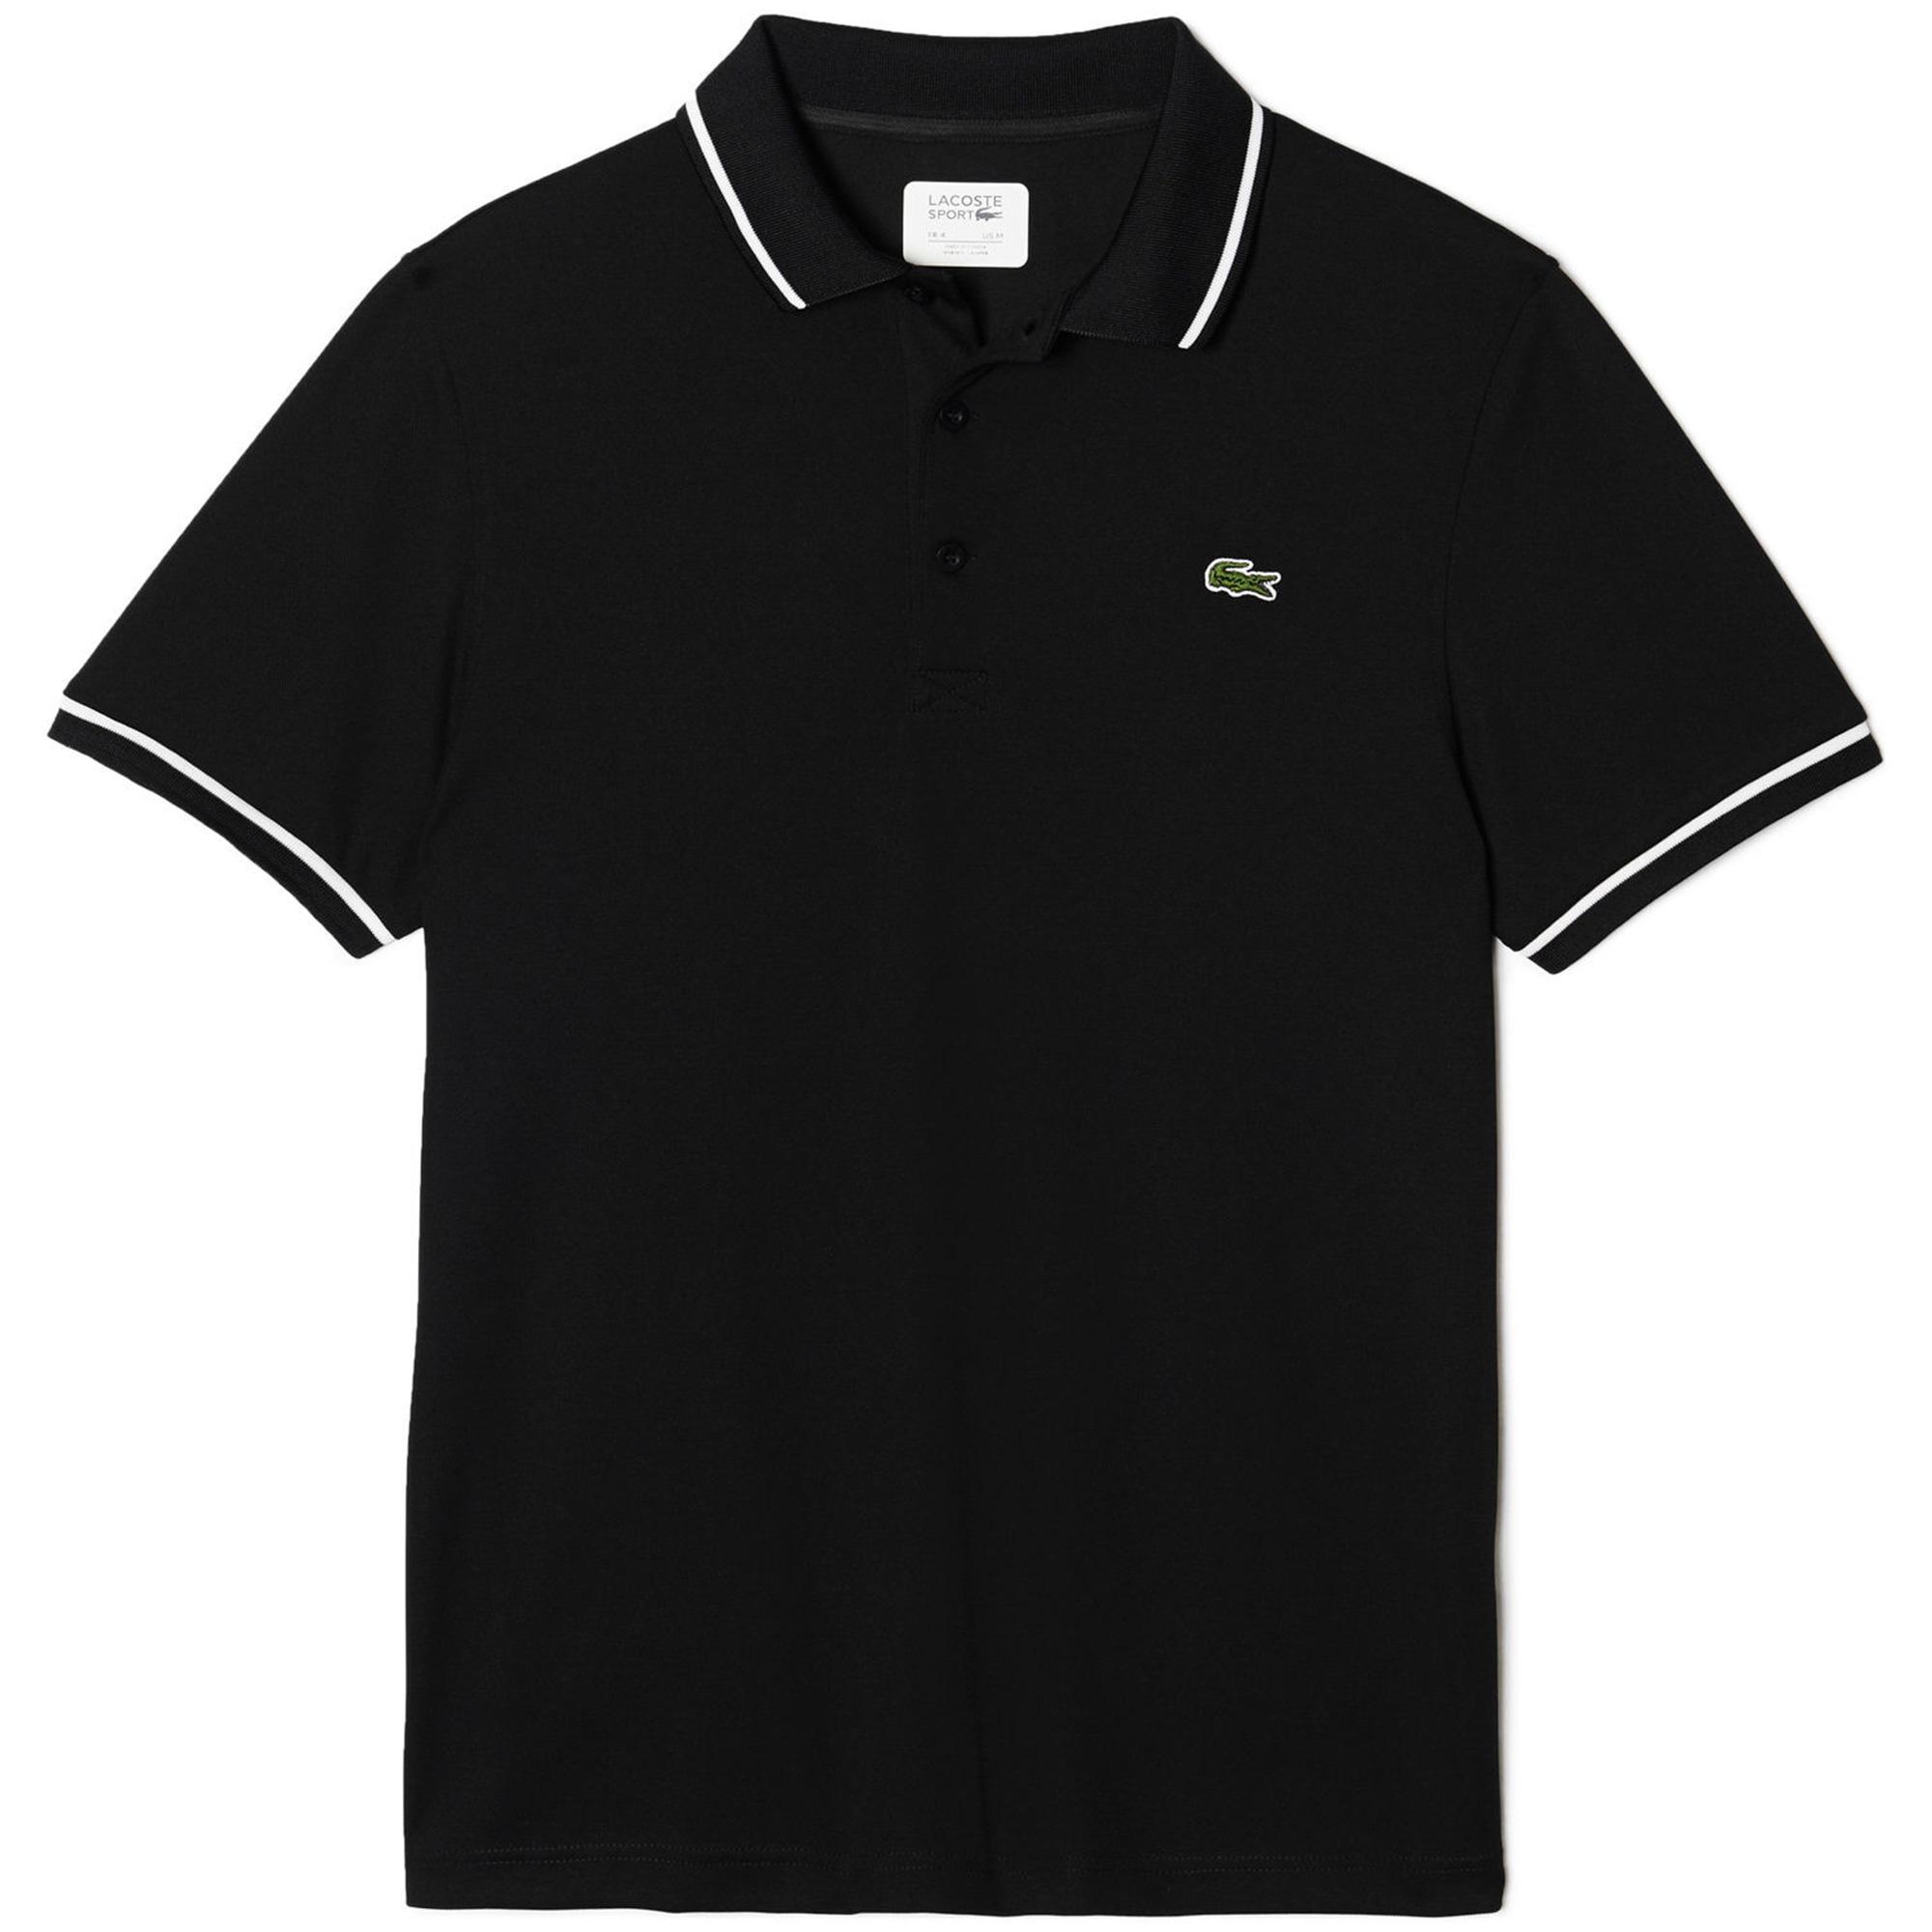 70f30de87 Lacoste Sport Mens Ultra-Dry Tennis Polo - Black White - Tennisnuts.com